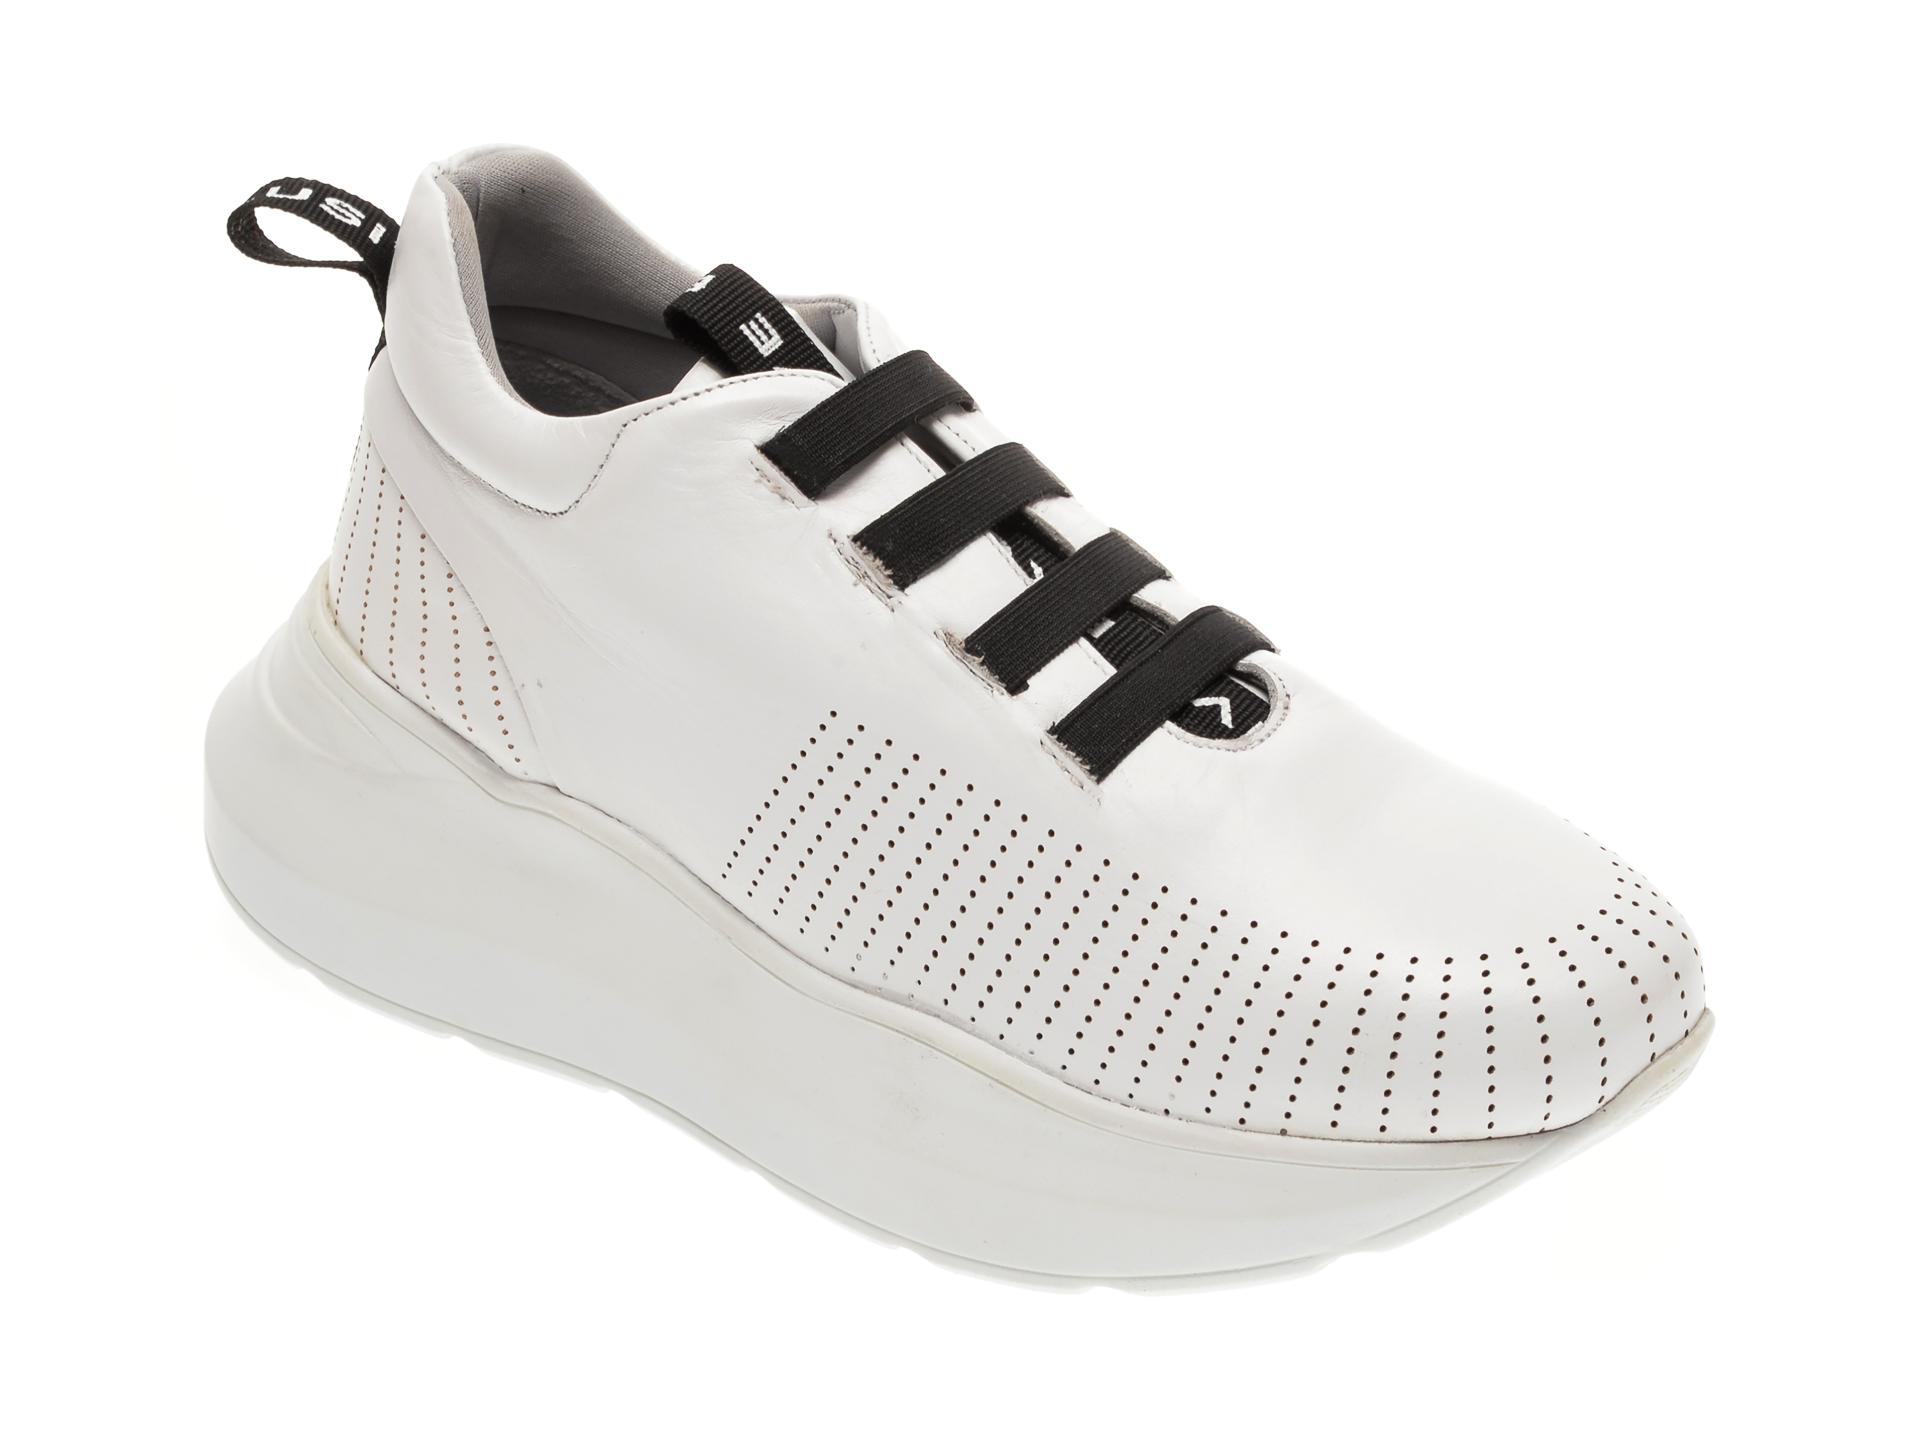 Pantofi BABOOS albi, 1302, din piele naturala imagine